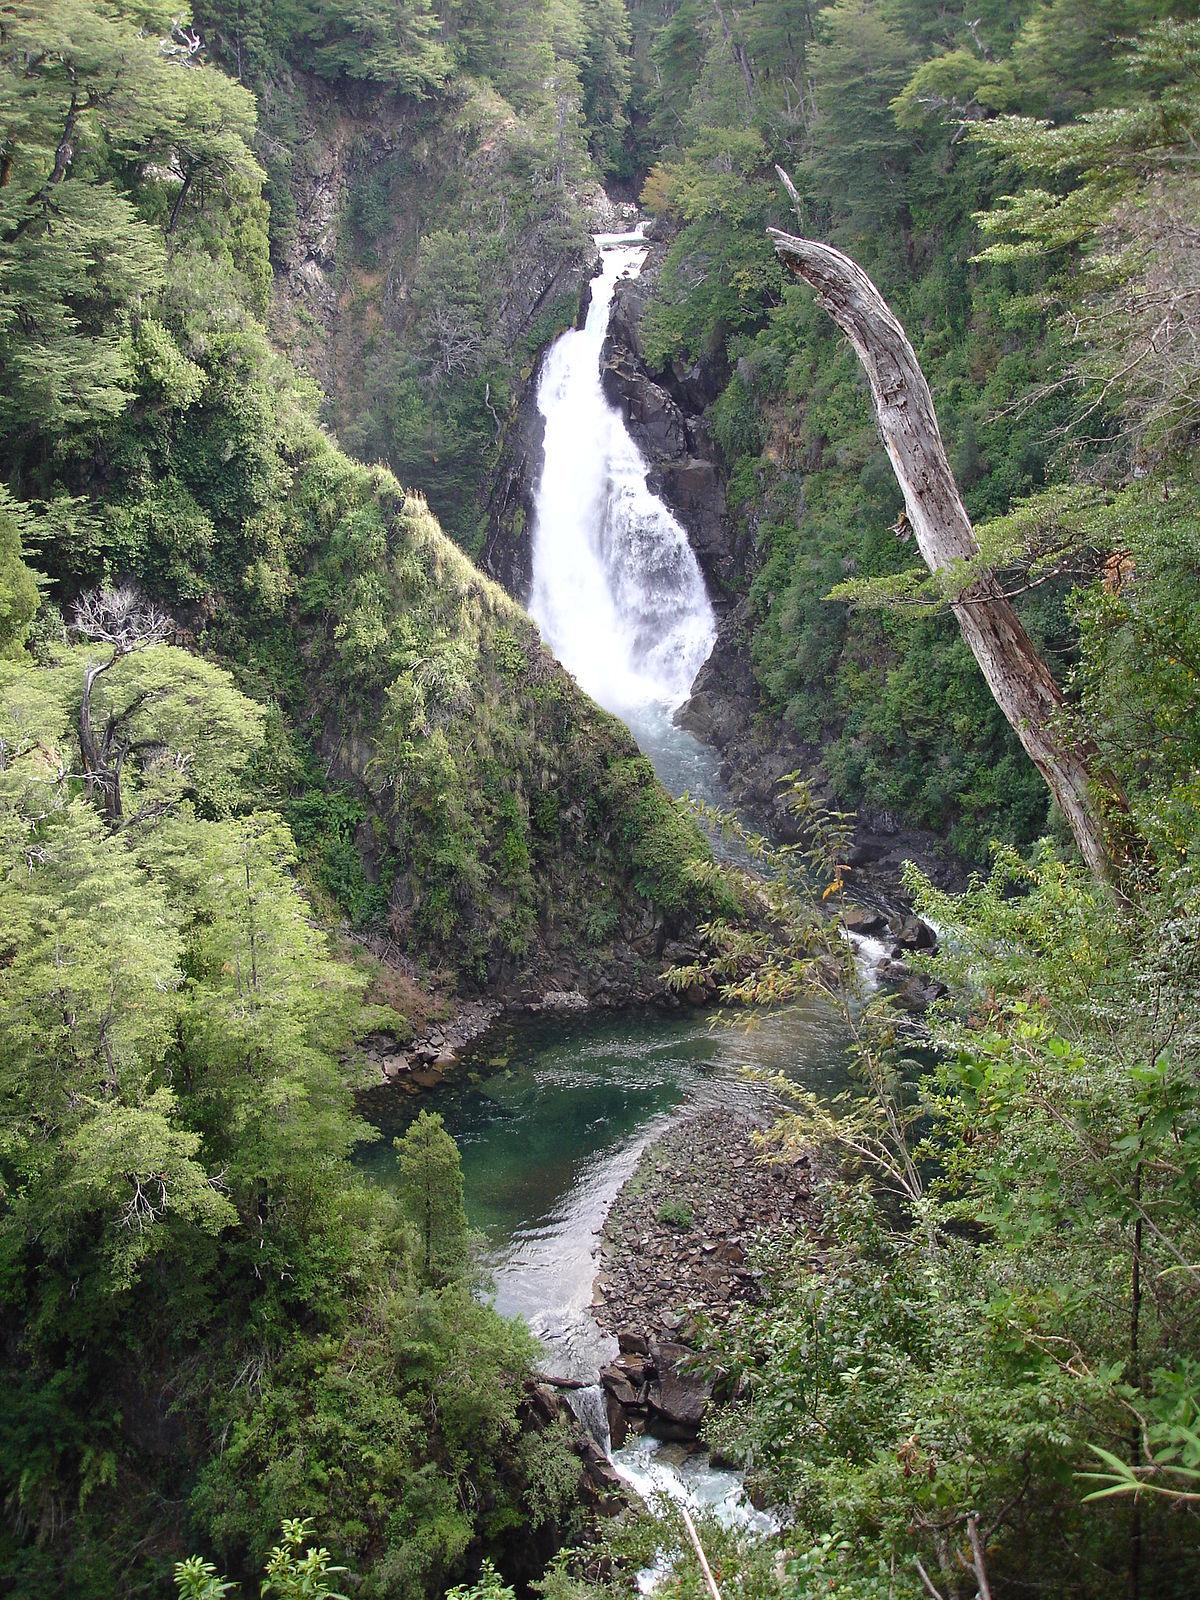 «Cascada Chachin PN Lanin» por Albasmalko - Trabajo propio. Disponible bajo la licencia CC BY-SA 3.0 vía Wikimedia Commons.